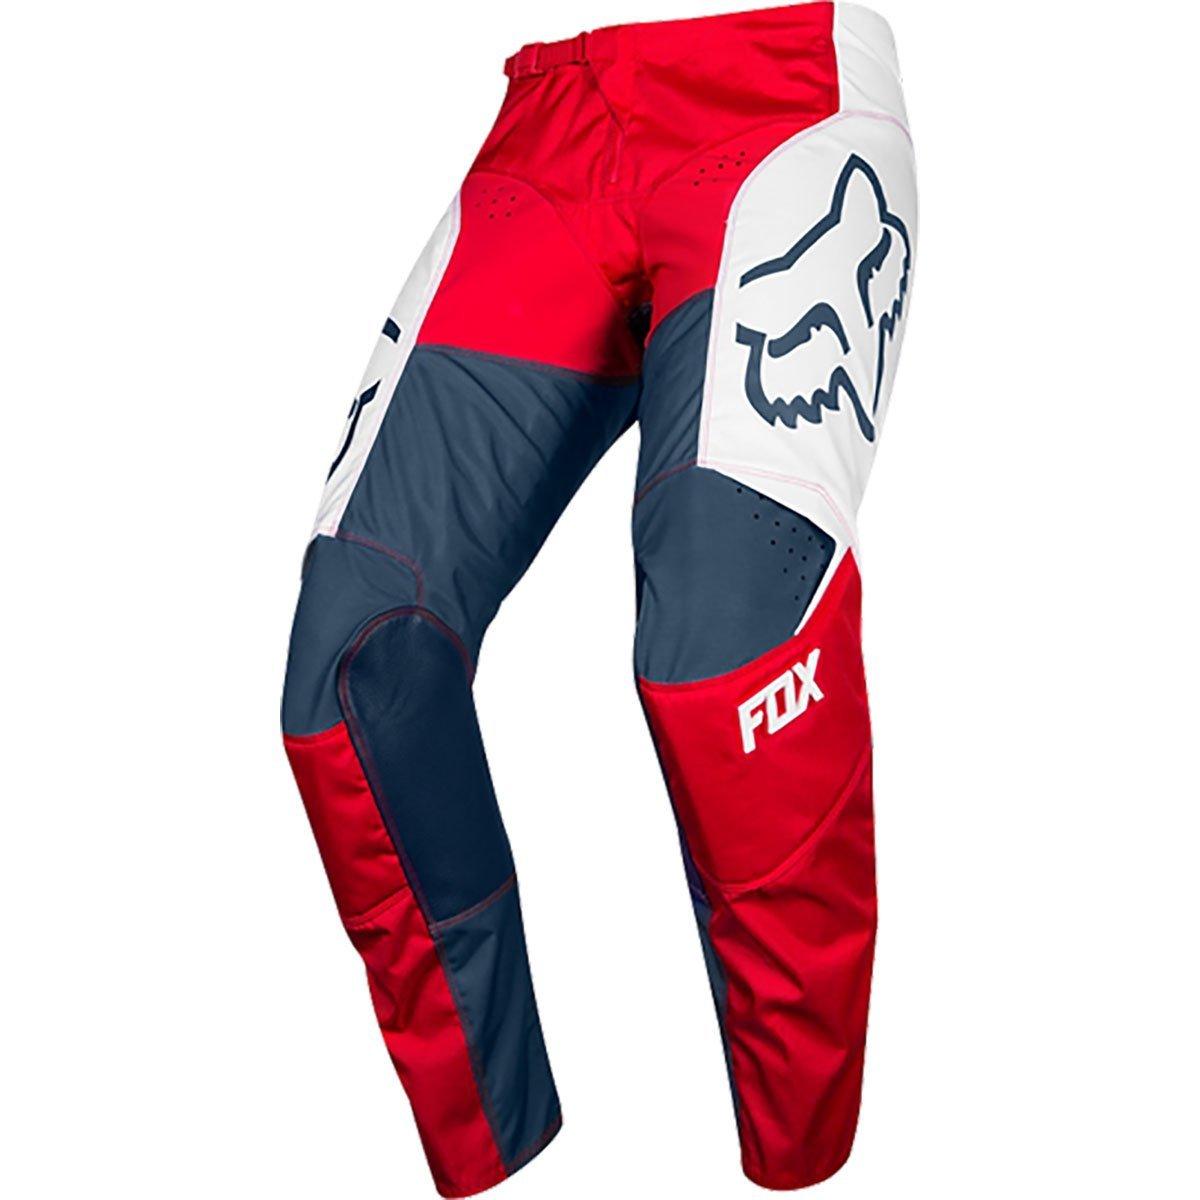 2019 Fox Racing 180 Przm Pants-Navy/Red-30